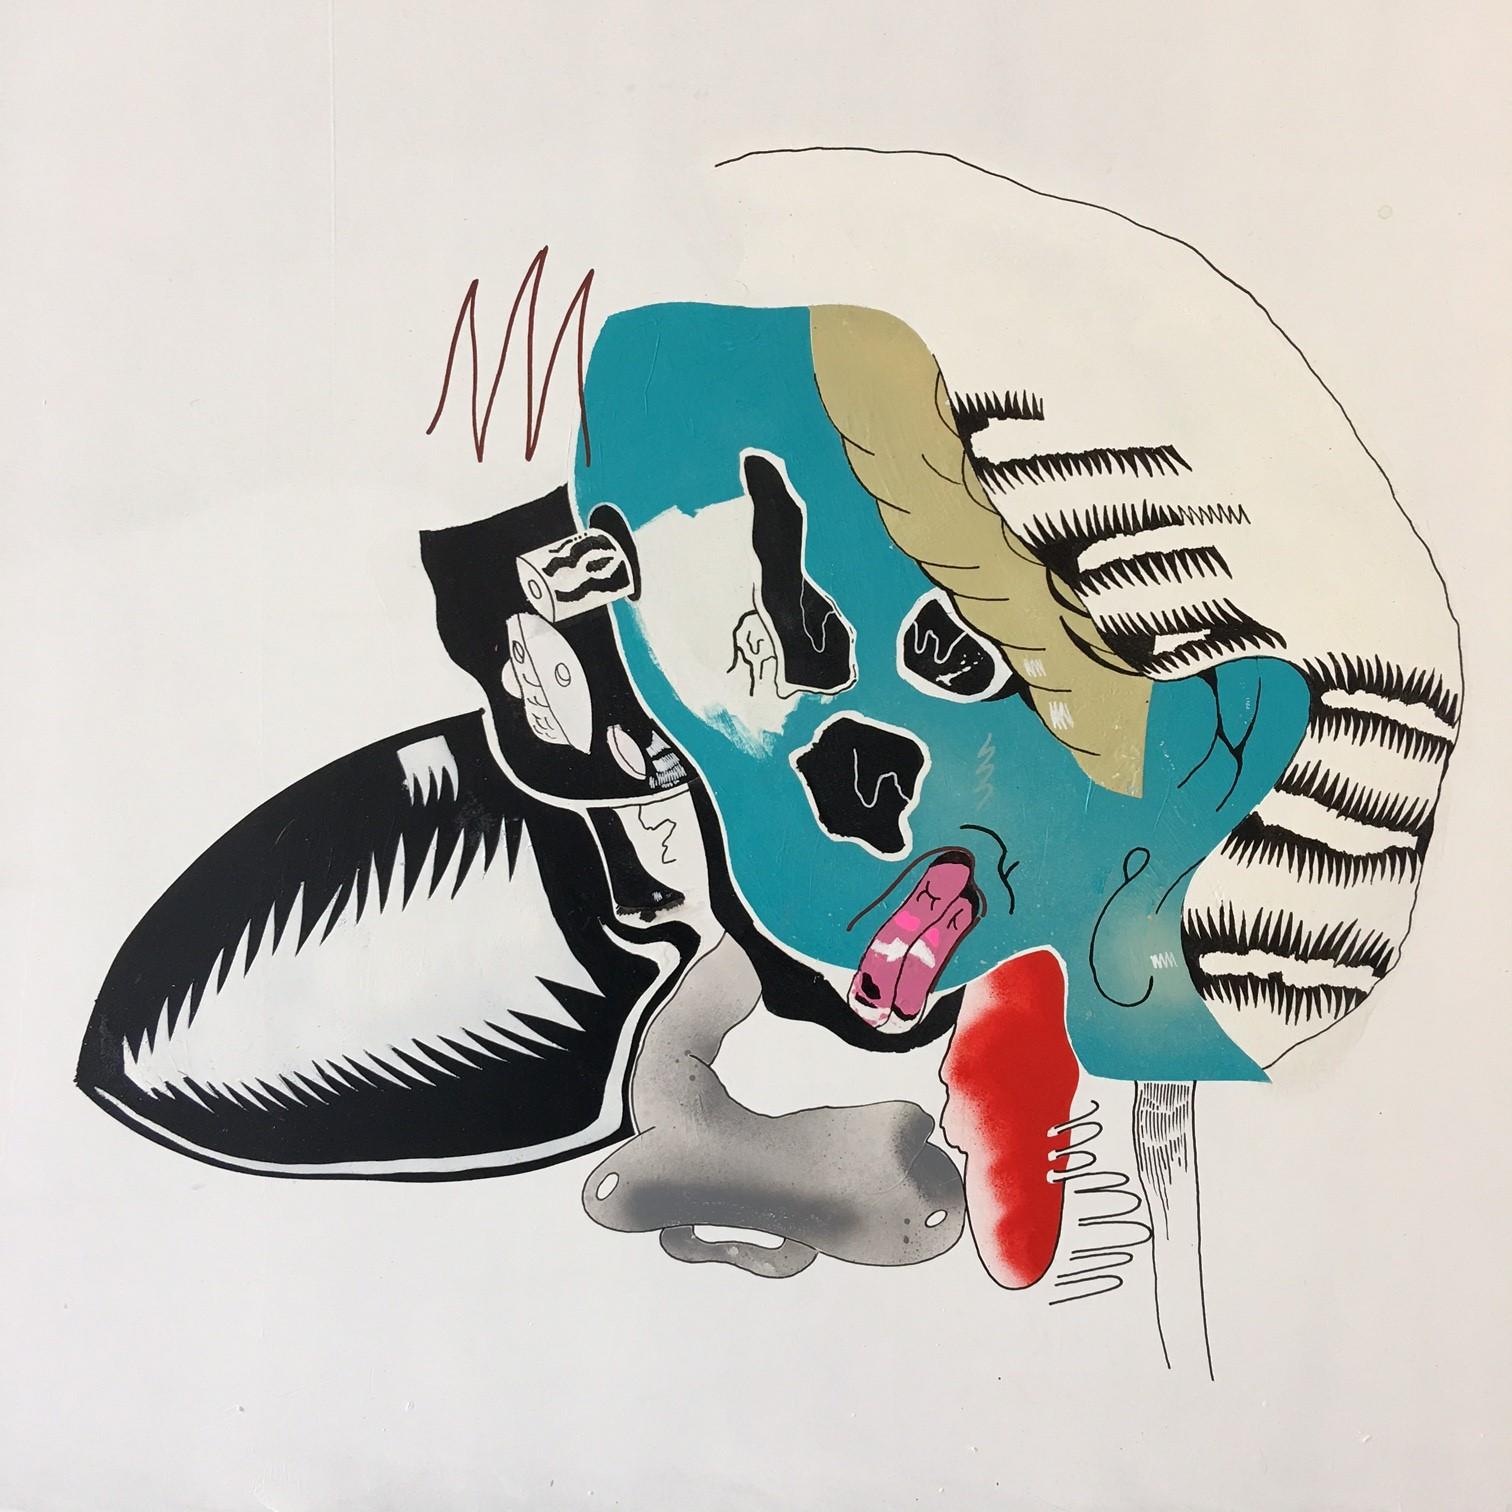 Sami , 2017  Acrylic media on Drywall  24 x 24 inches